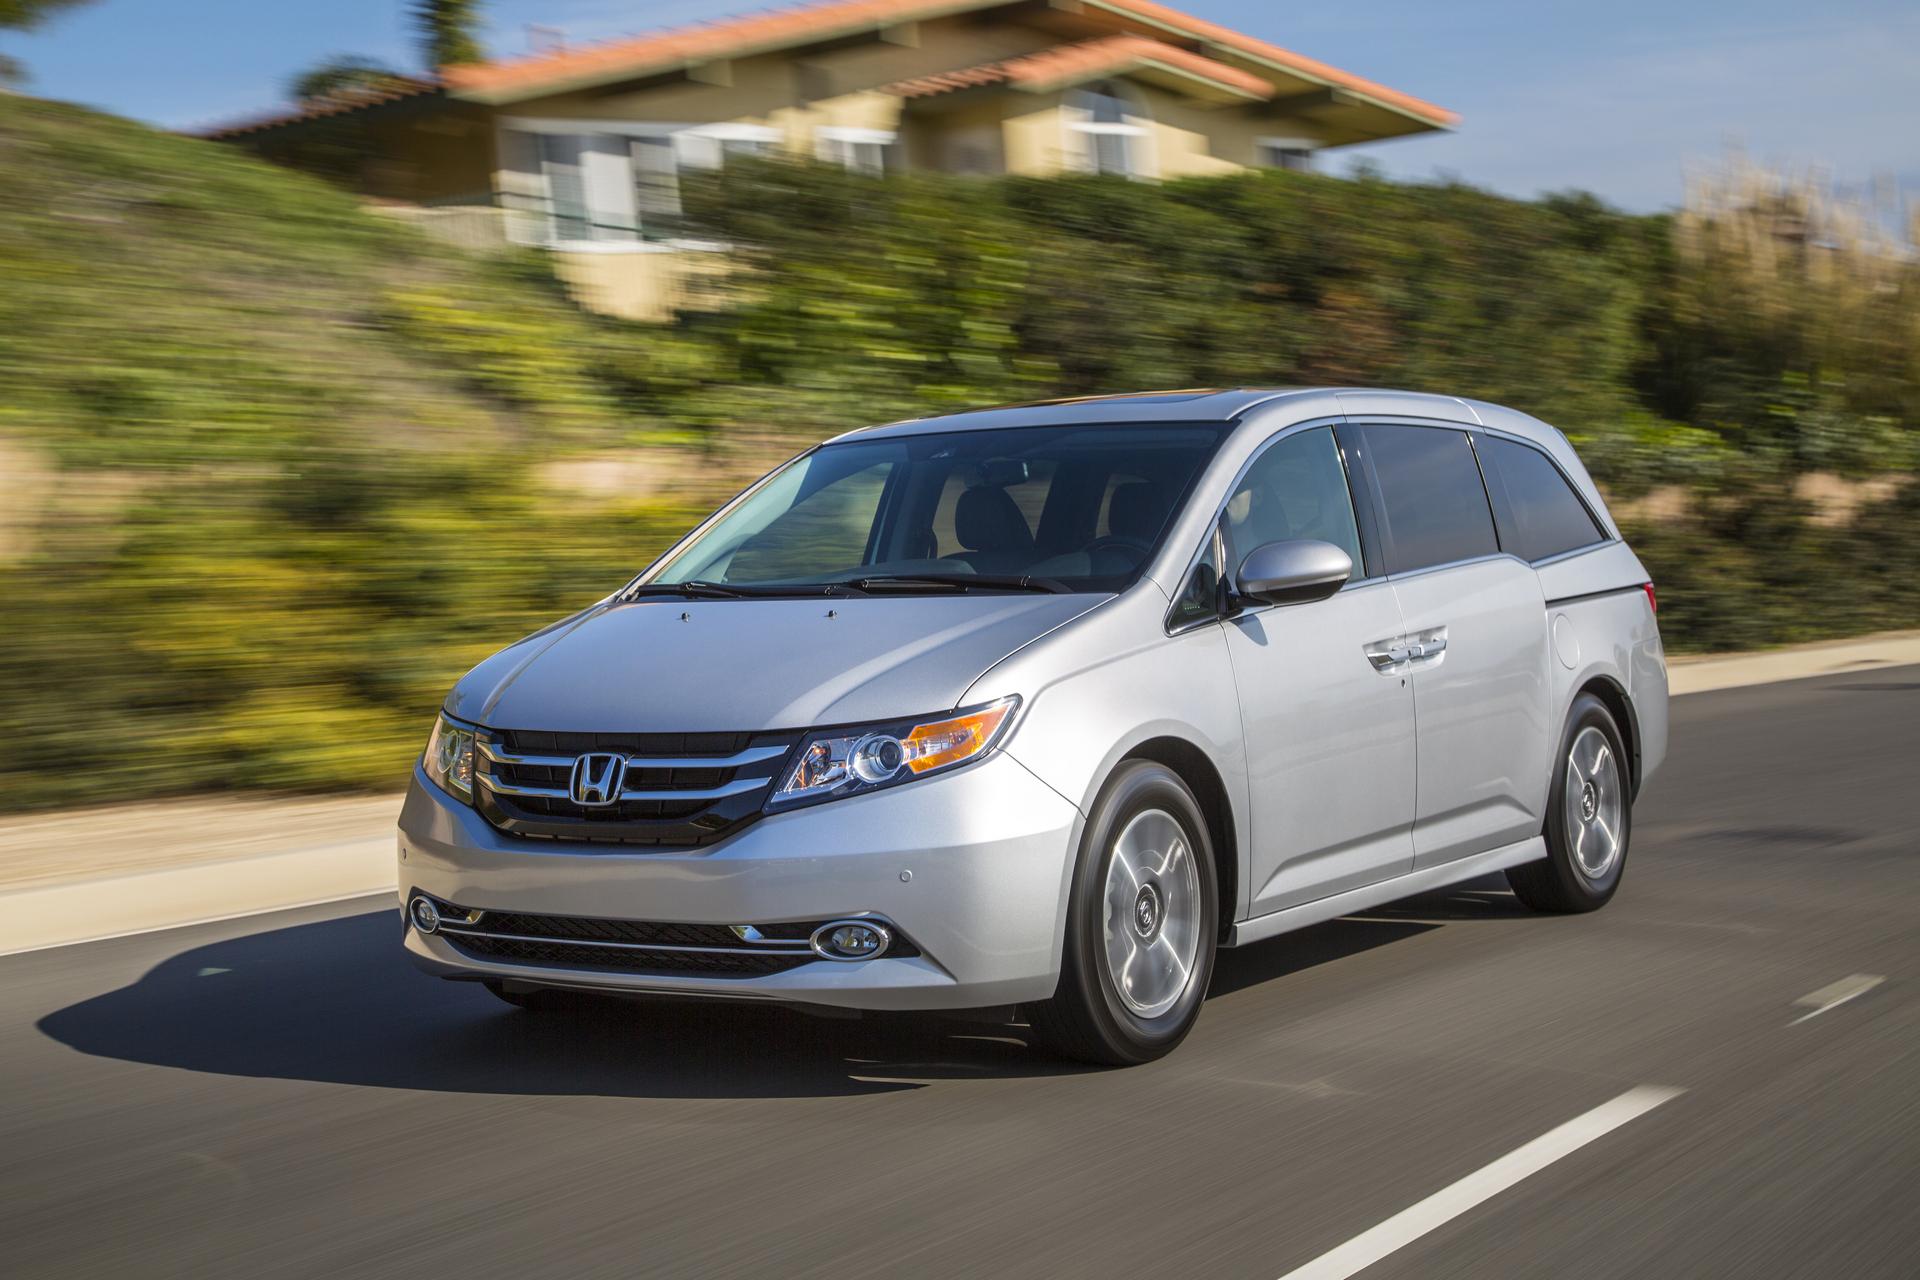 2016 Honda Odyssey © Honda Motor Co., Ltd.